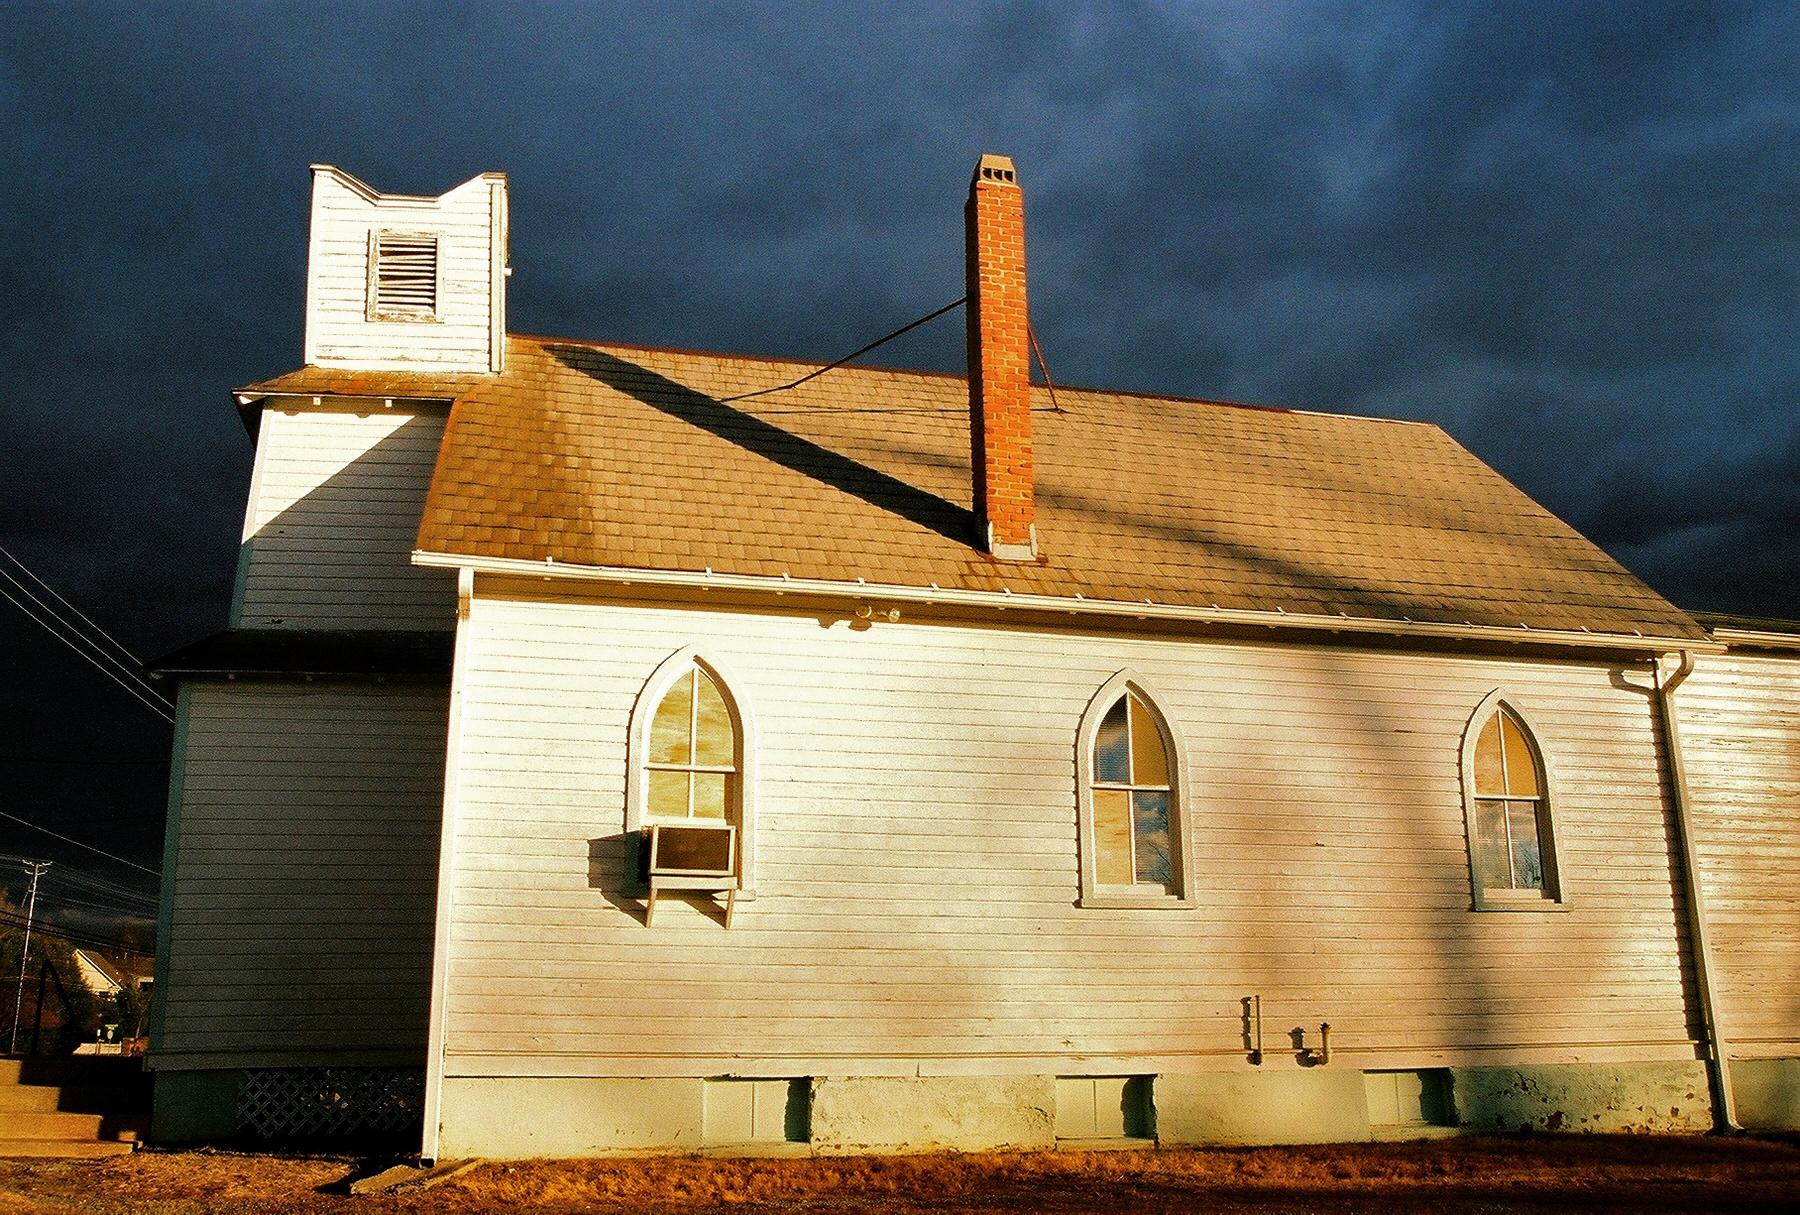 Mt of Olives Church  Gaithersburg, Maryland  March 2011  (Kodak Ultramax 400)